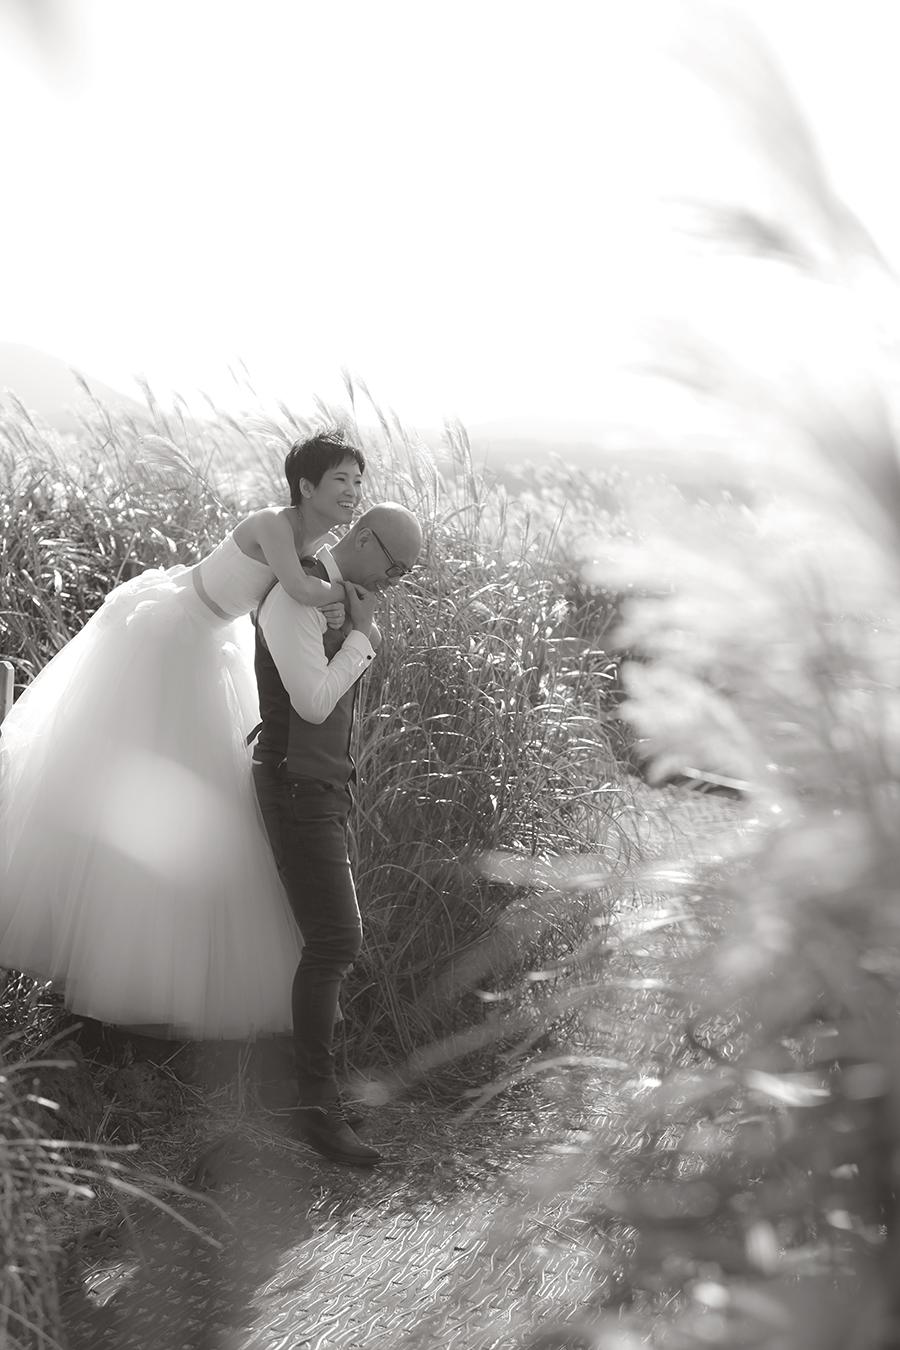 seoul jeju korea . wedding photography by kurt ahs . steve+chloe . 8047.jpg